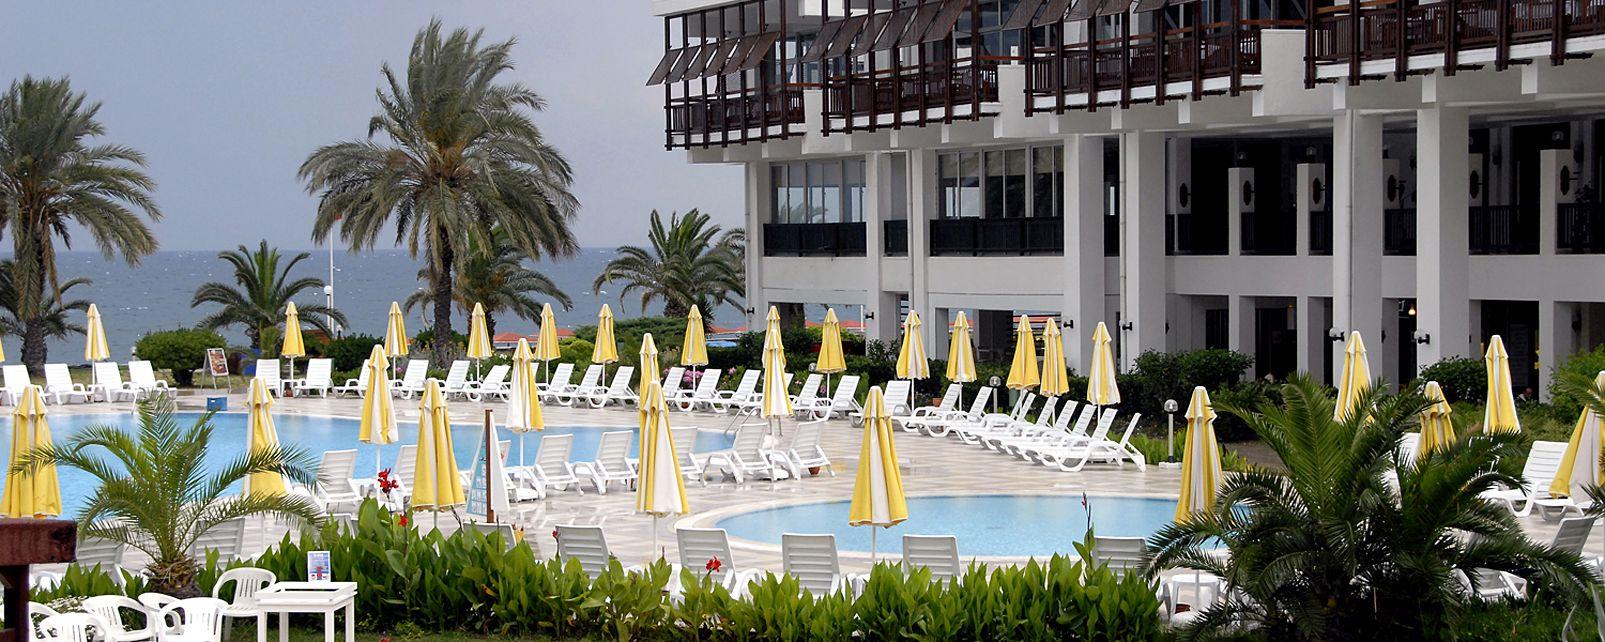 Hôtel Hydros Beach Resort